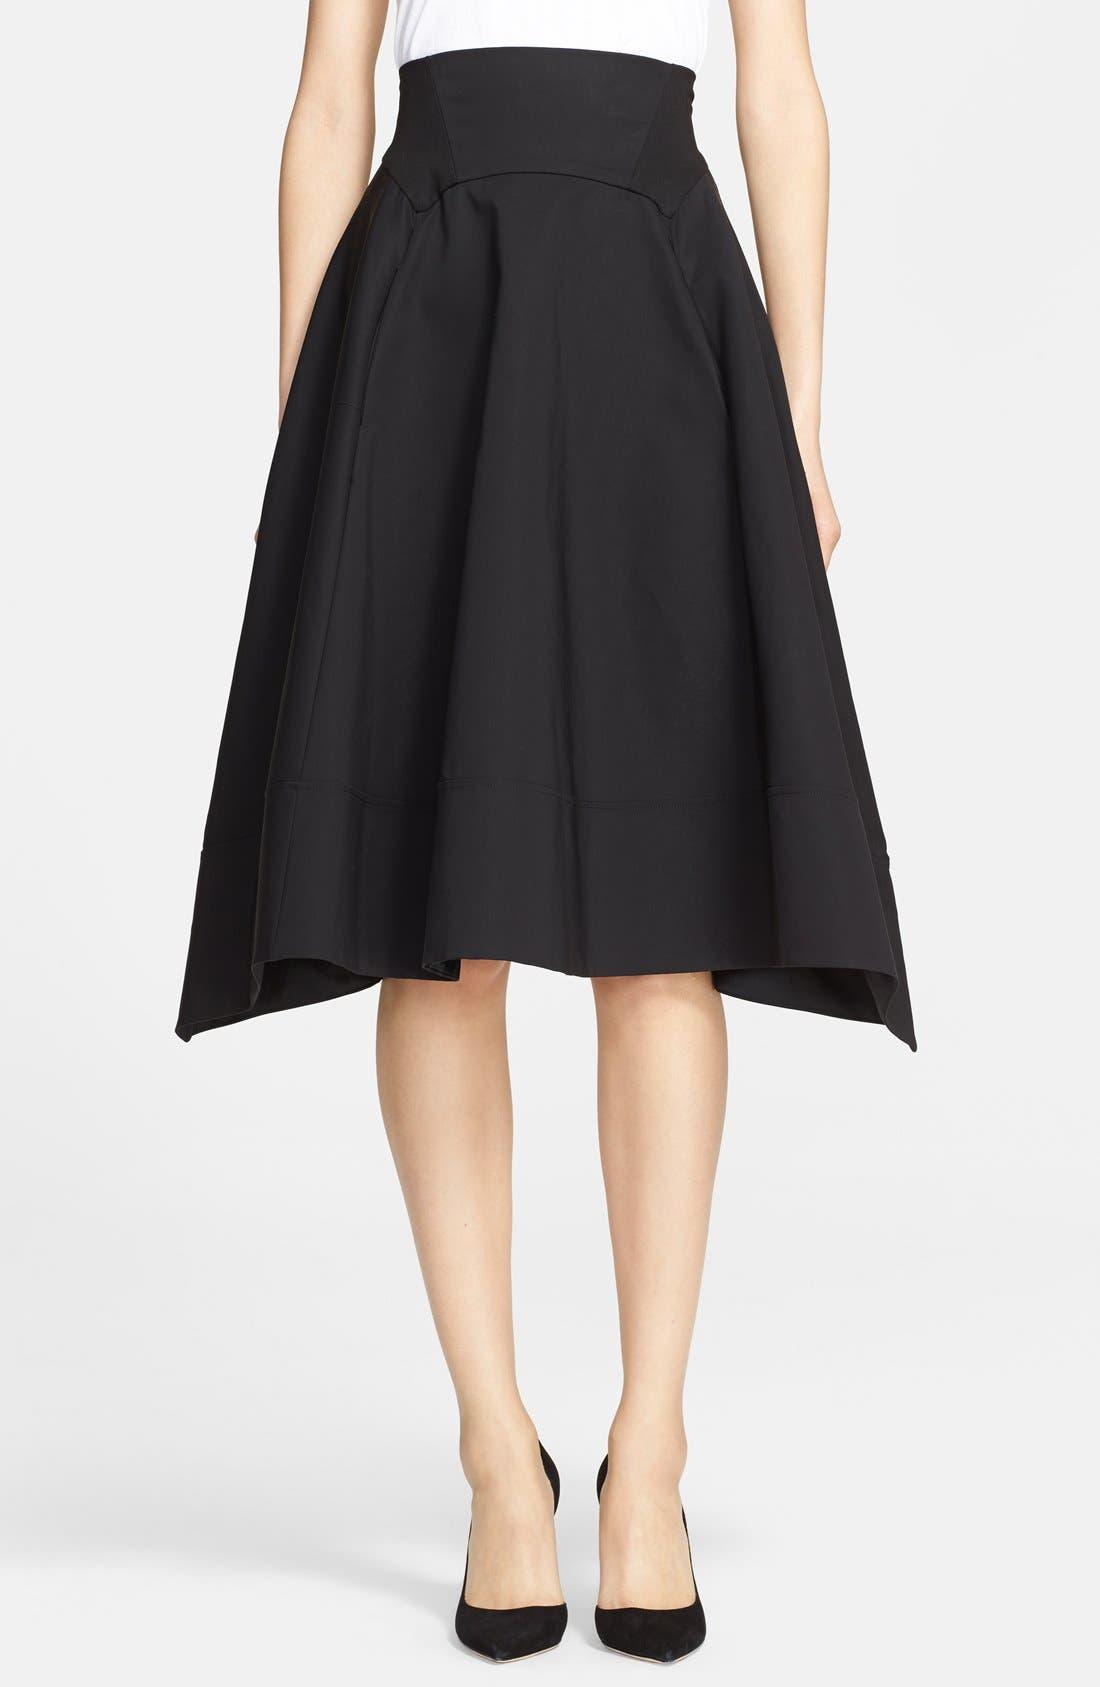 Donna Karan Collection Cotton Taffeta Skirt,                         Main,                         color, 001